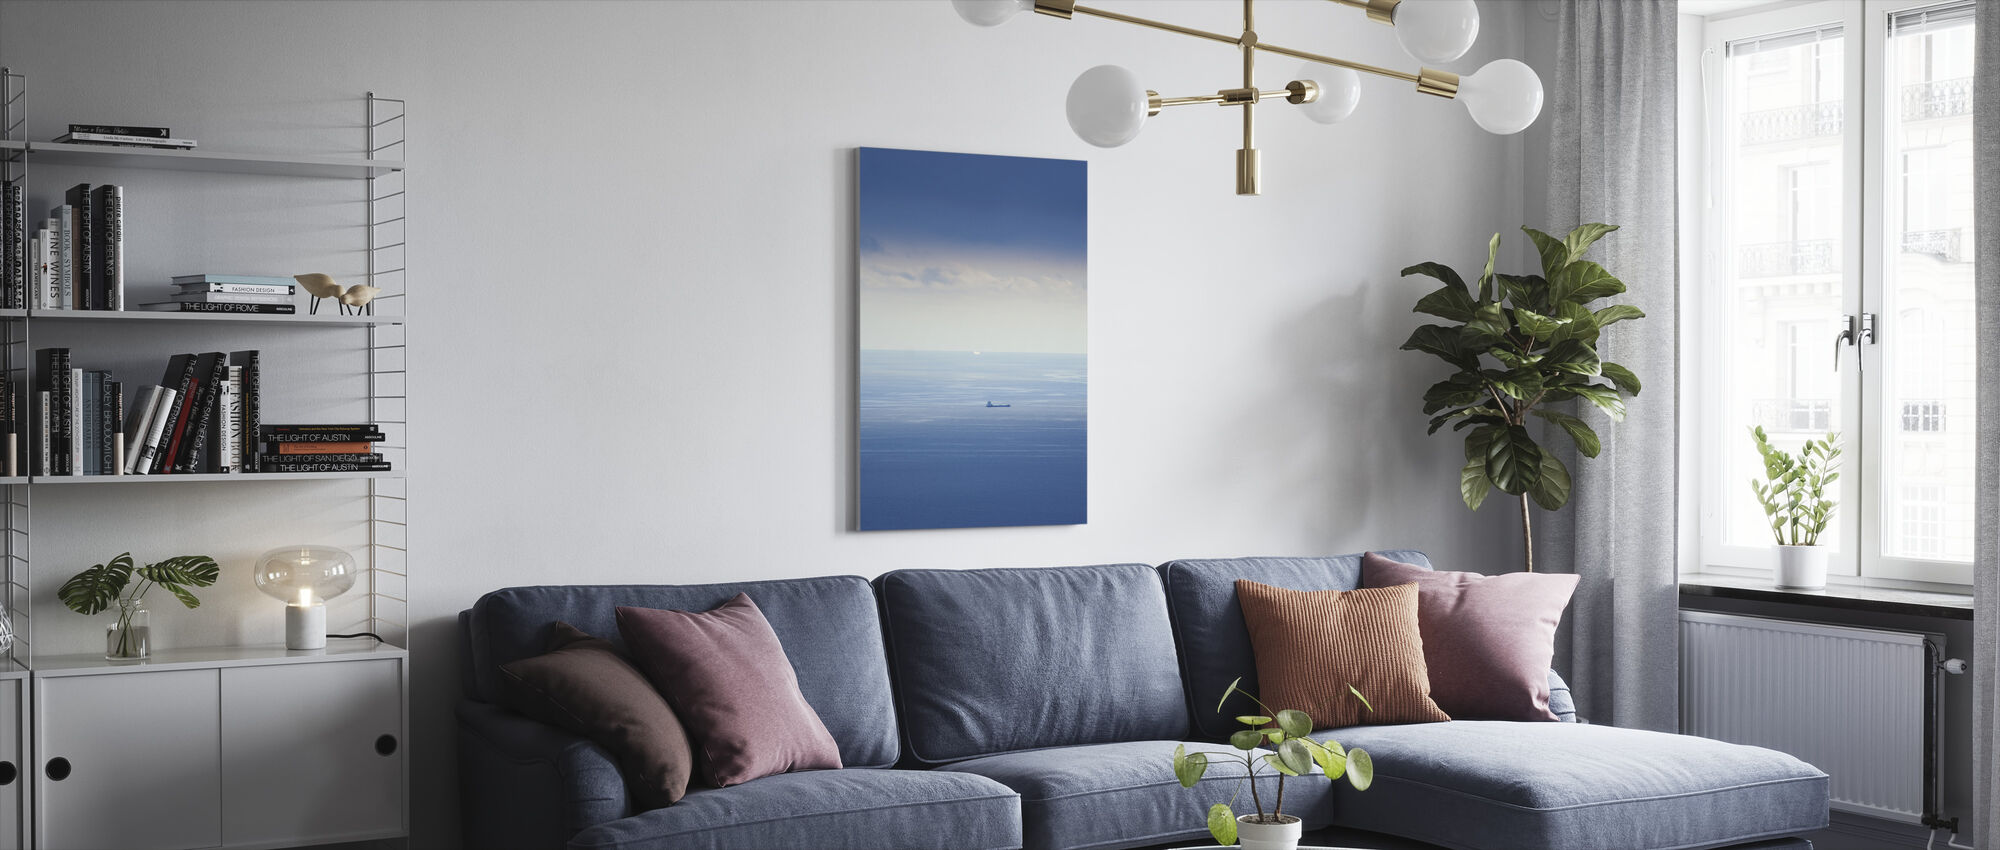 Ship in Mediterranean Sea - Canvas print - Living Room